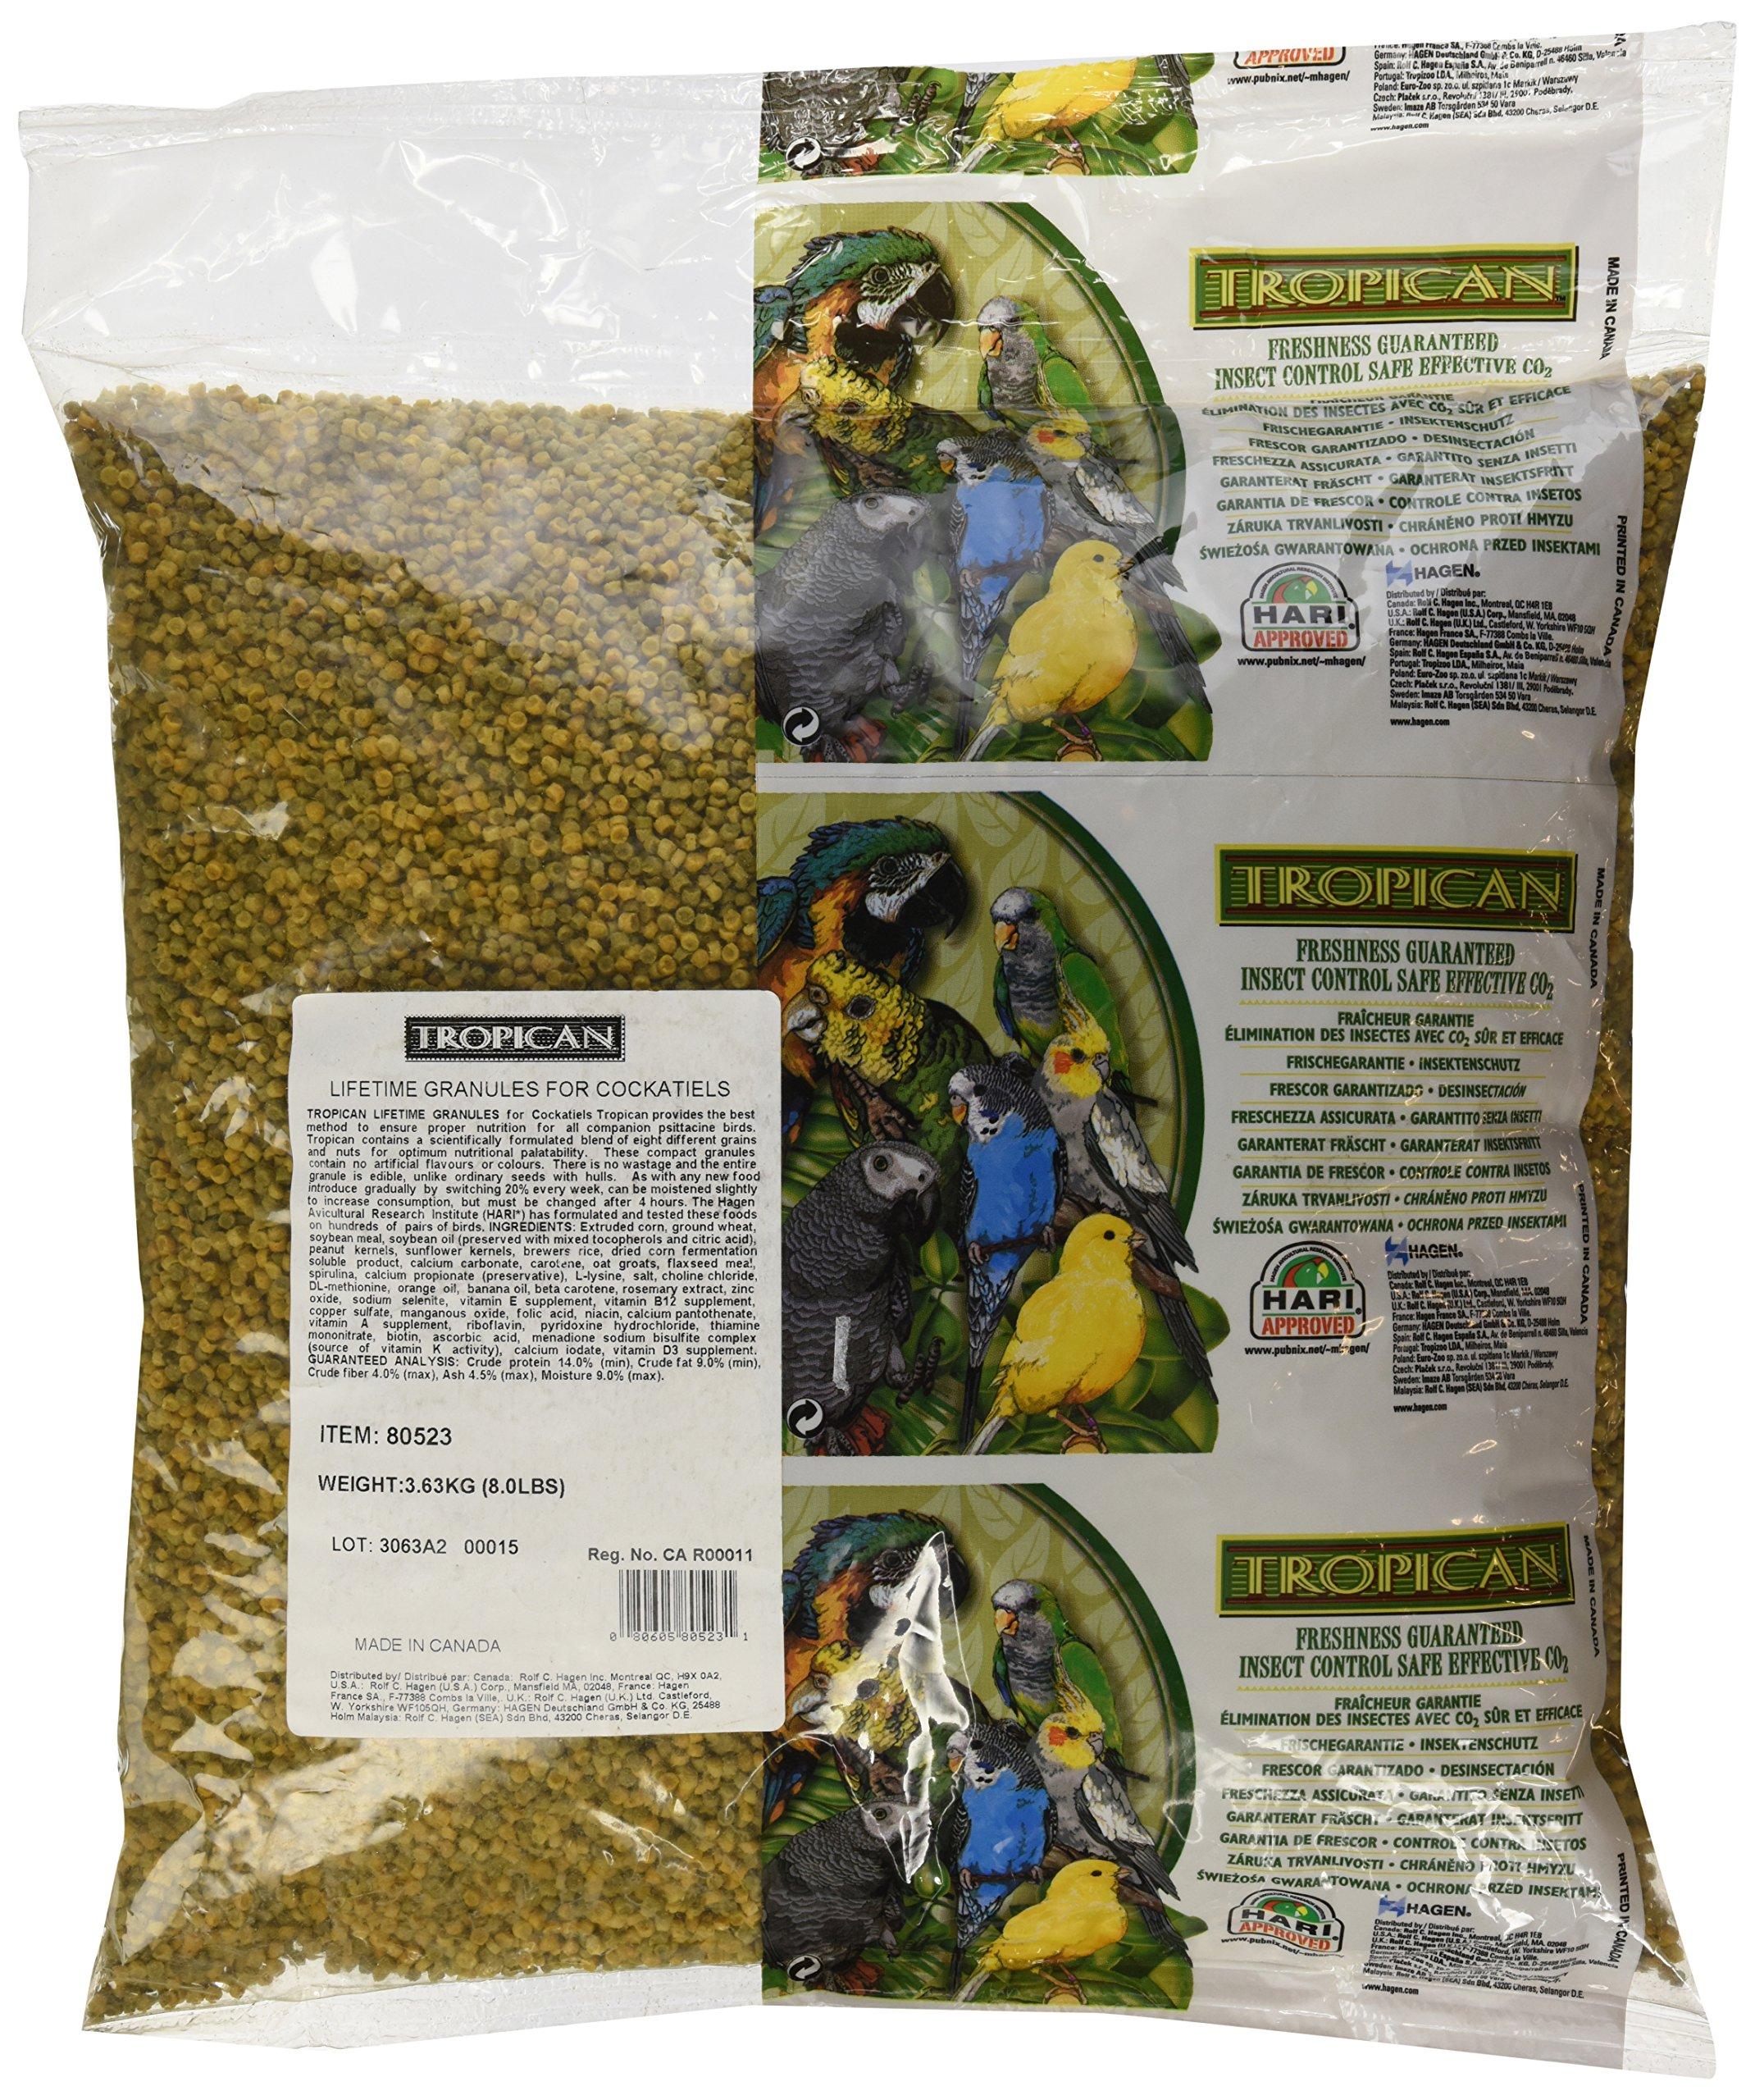 Tropican Lifetime Formula Cockatiel Granules, 8-Pound